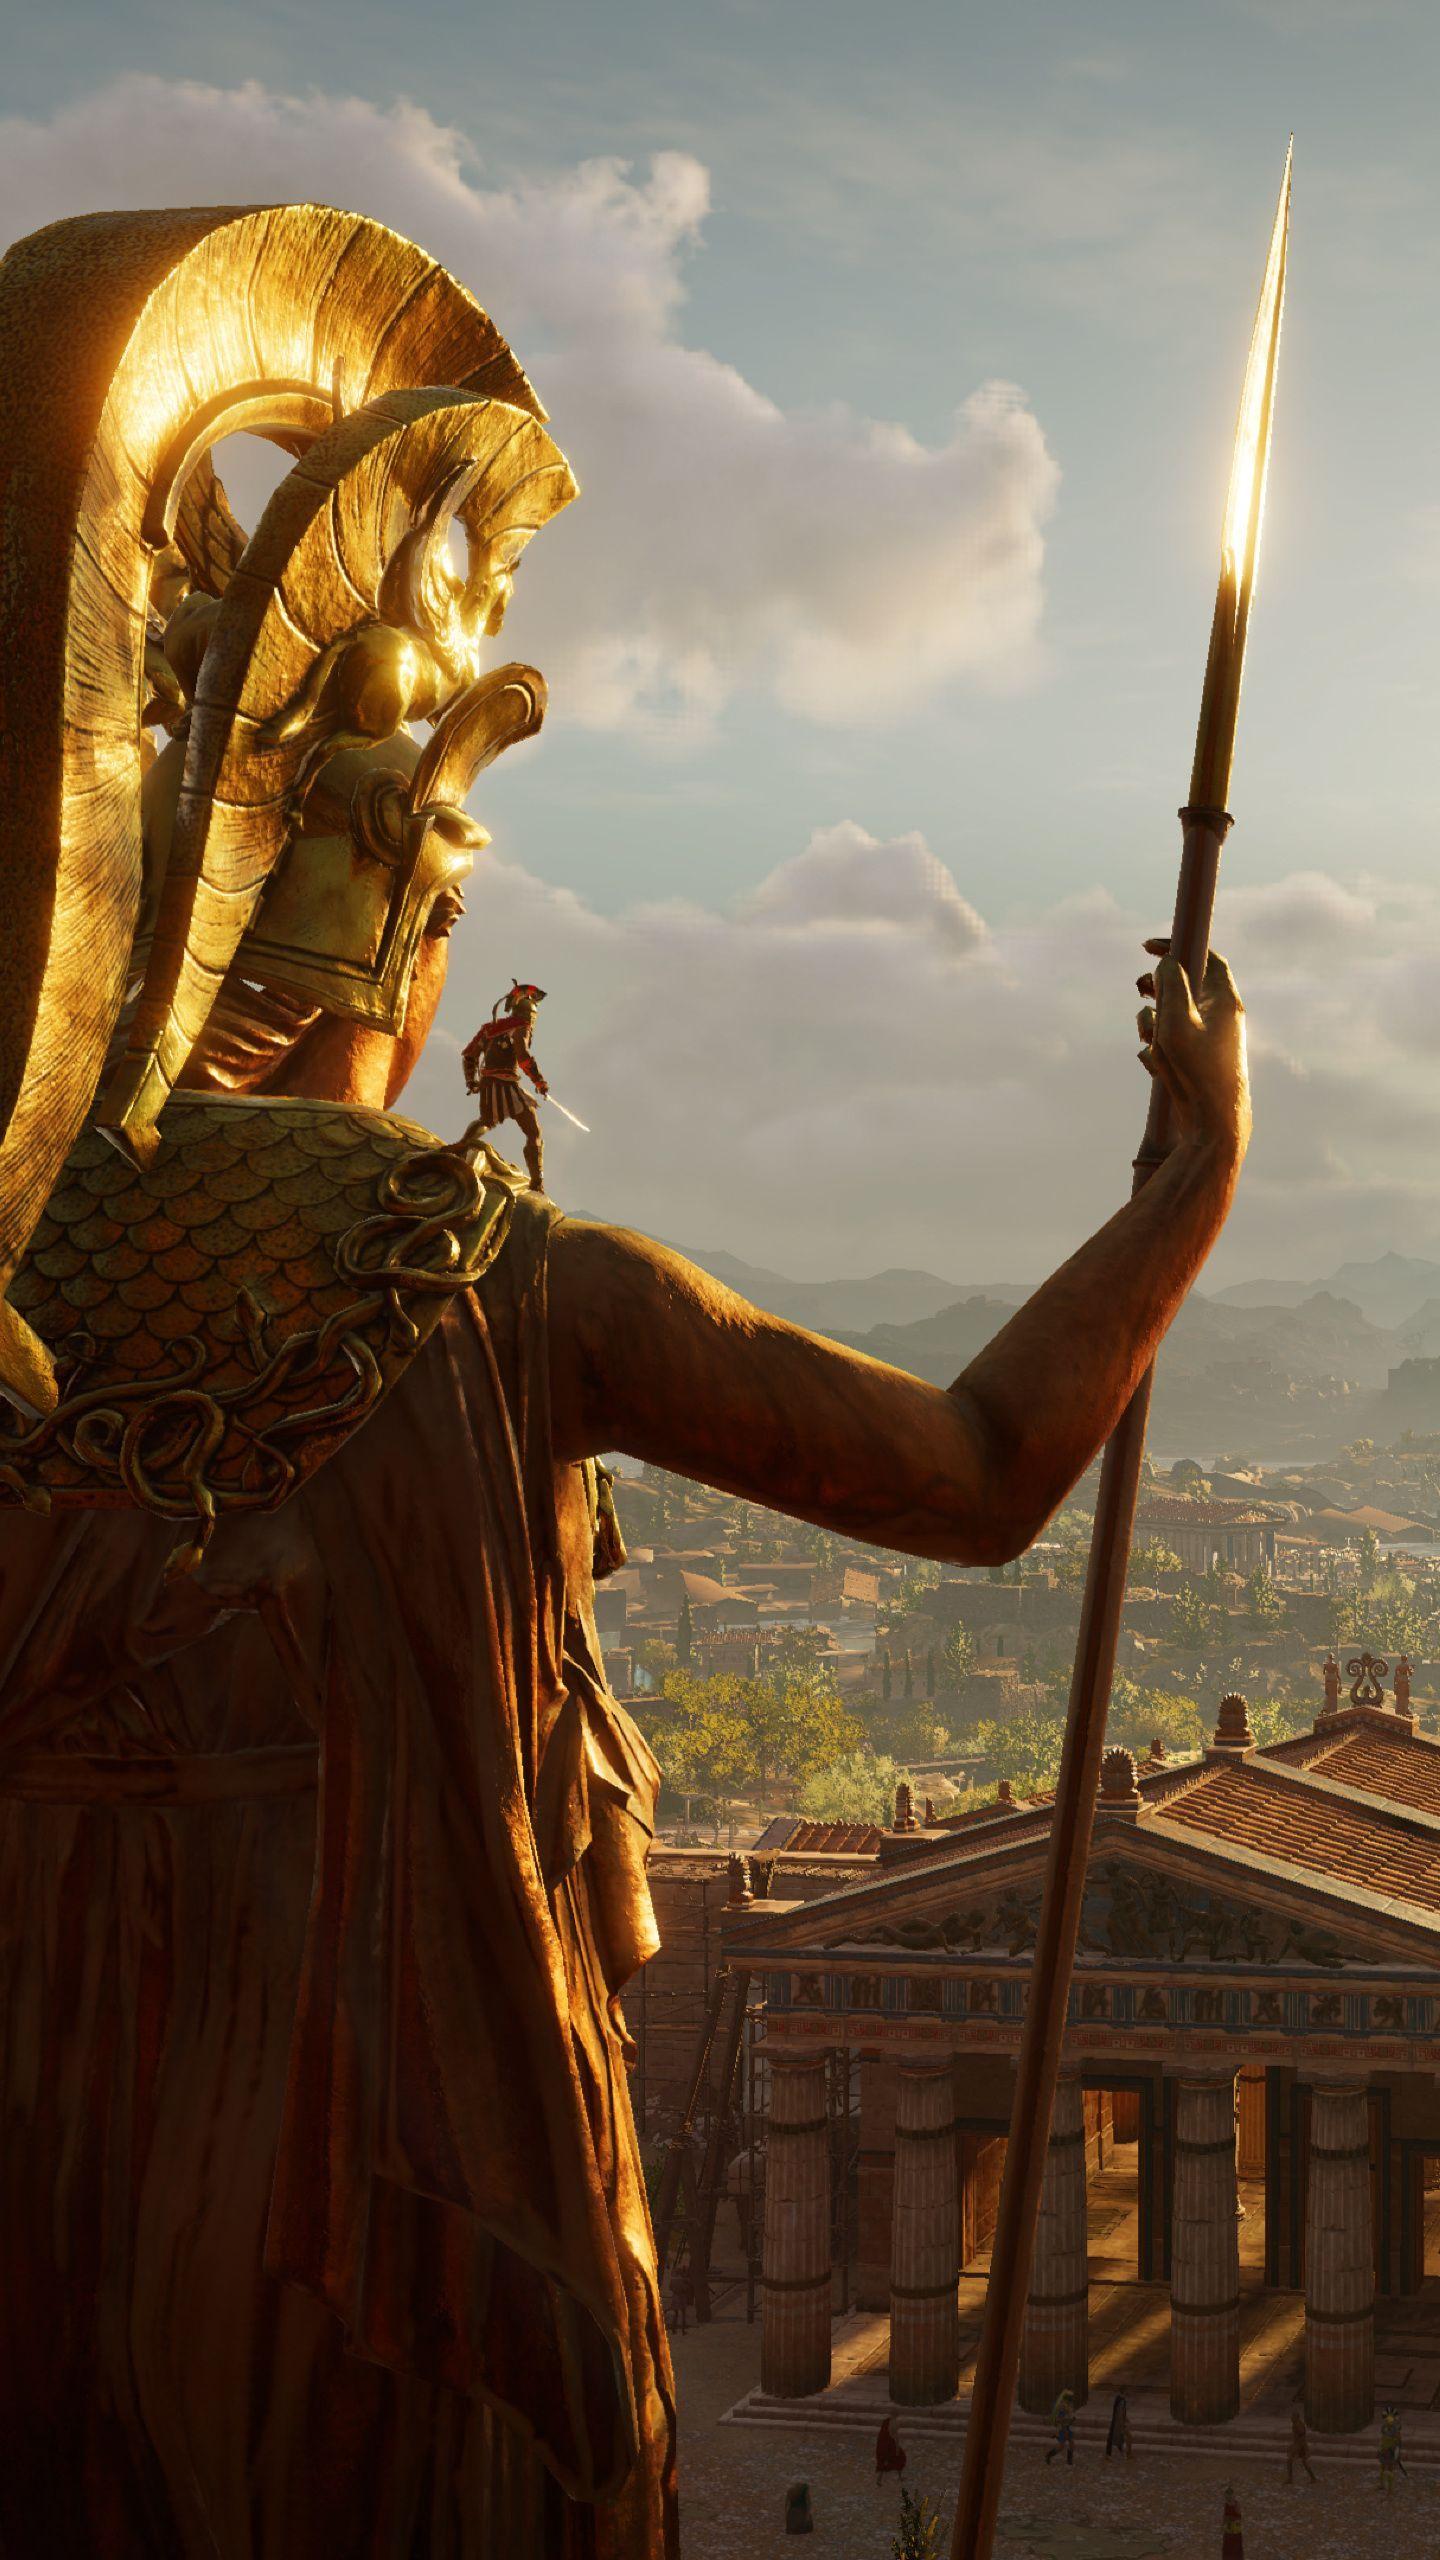 Download Assassin S Creed Odyssey 1440x2560 Resolution Hd 4k Wallpaper Assassins Creed Assassins Creed Odyssey Greek Warrior